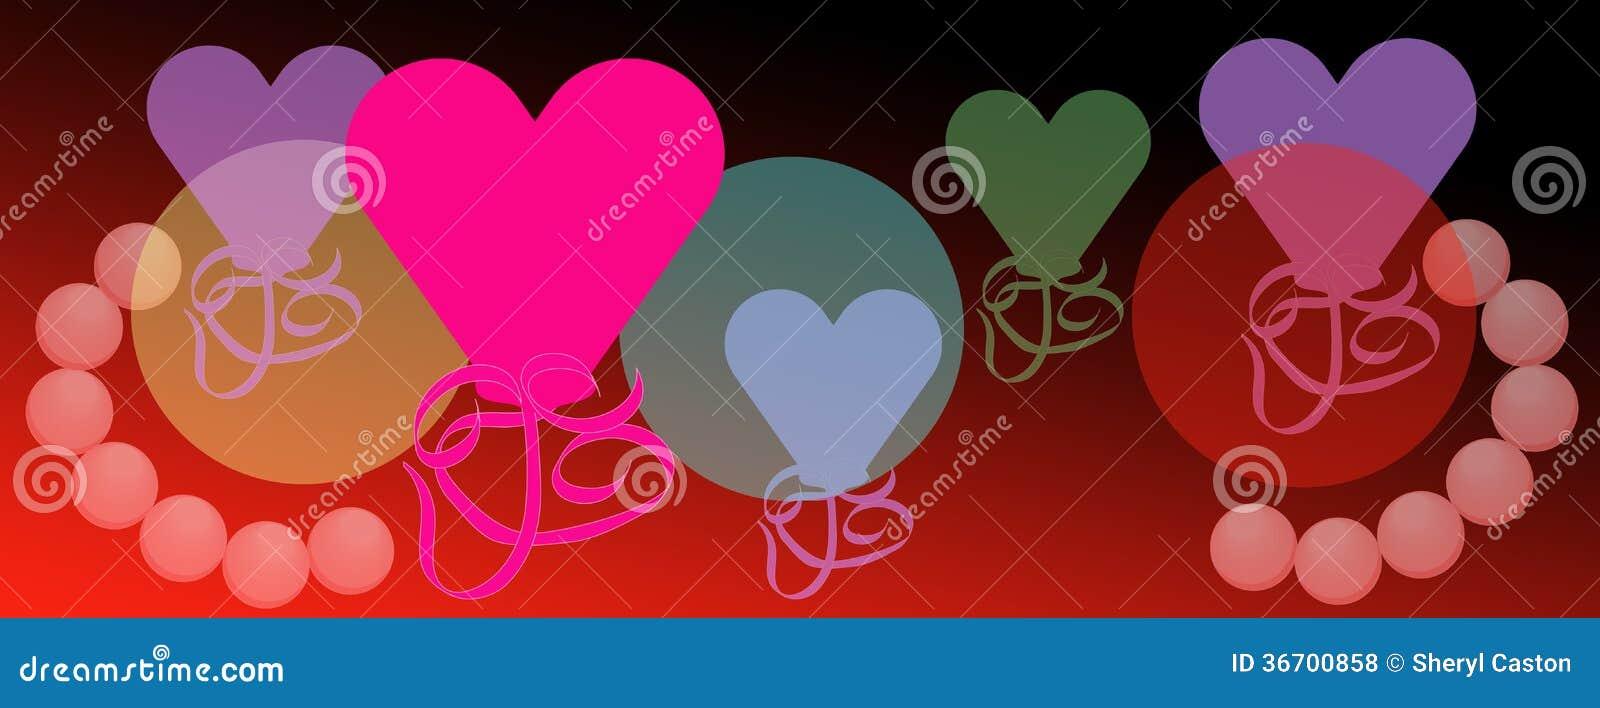 Bright Valentine Hearts Celebration Of Love Background